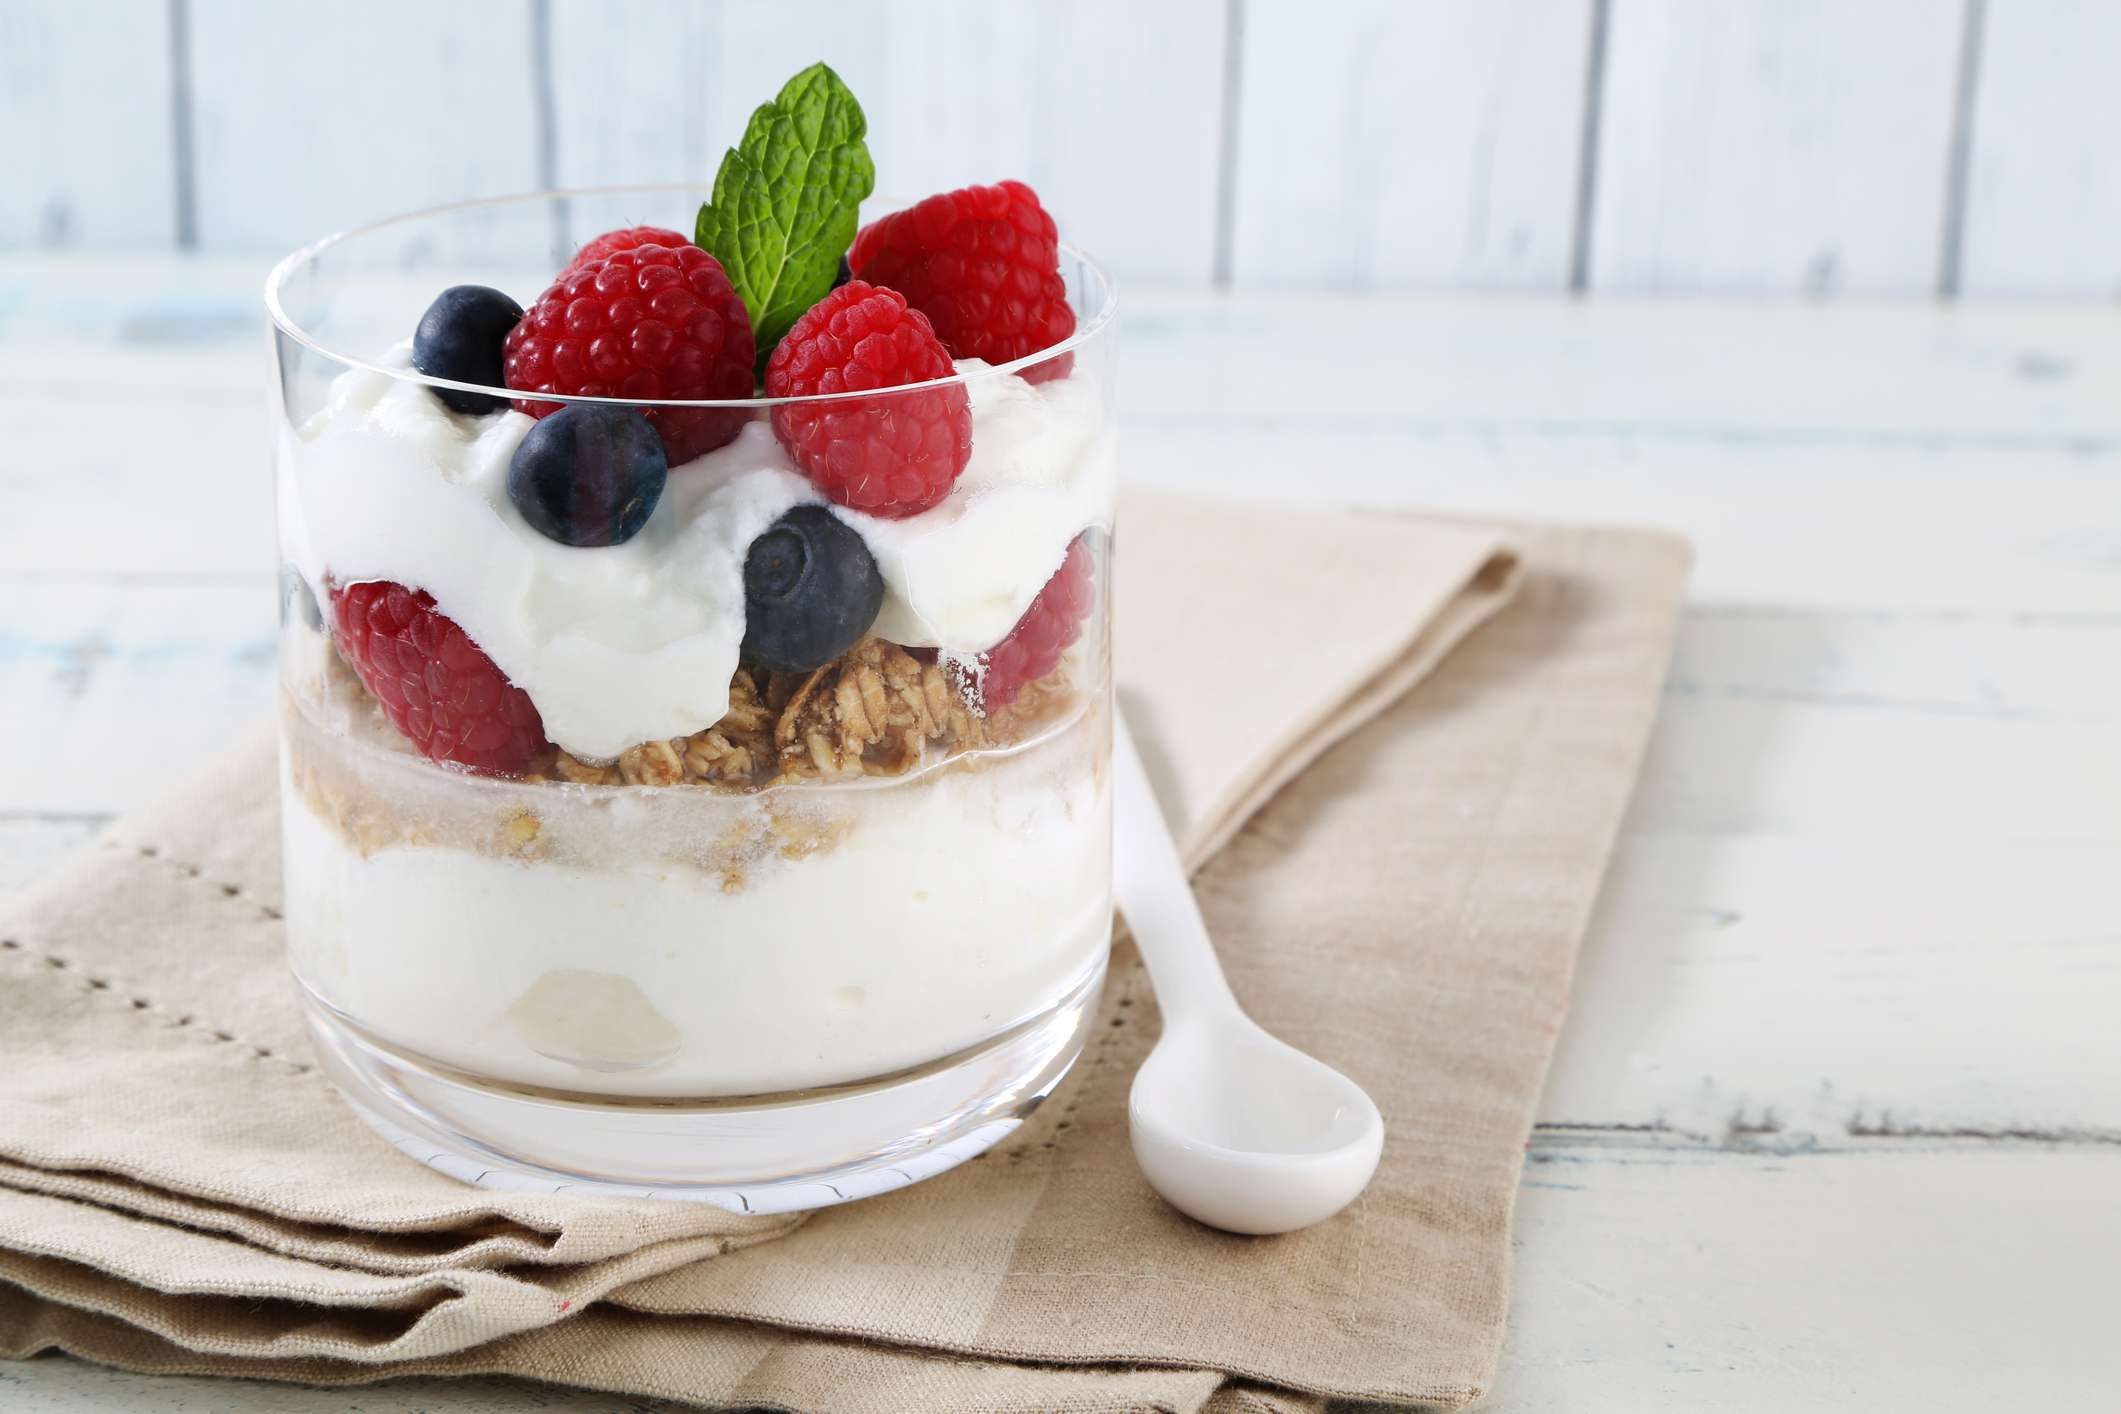 Greek Yogurt and Fruit